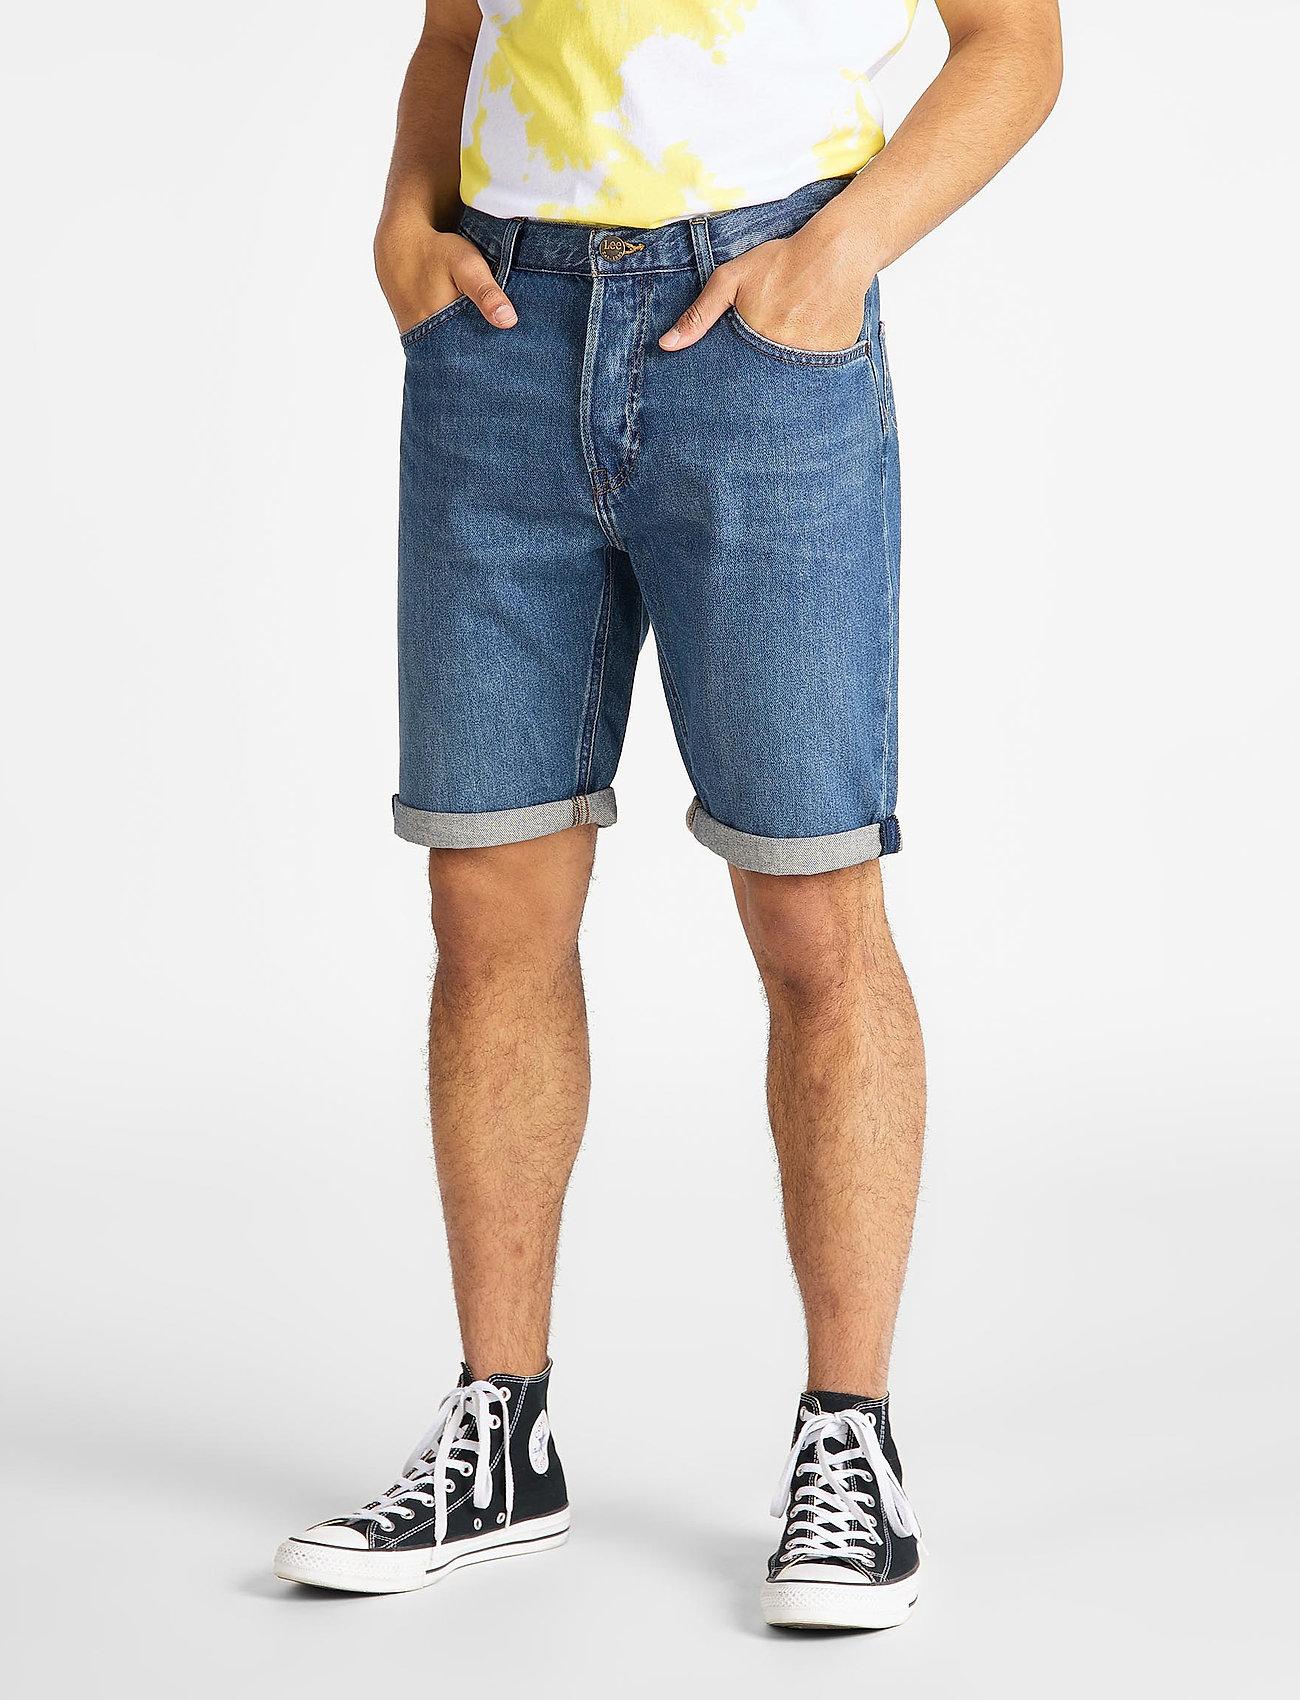 Lee Jeans - 5 POCKET SHORT - farkkushortsit - soft mid aliso - 0